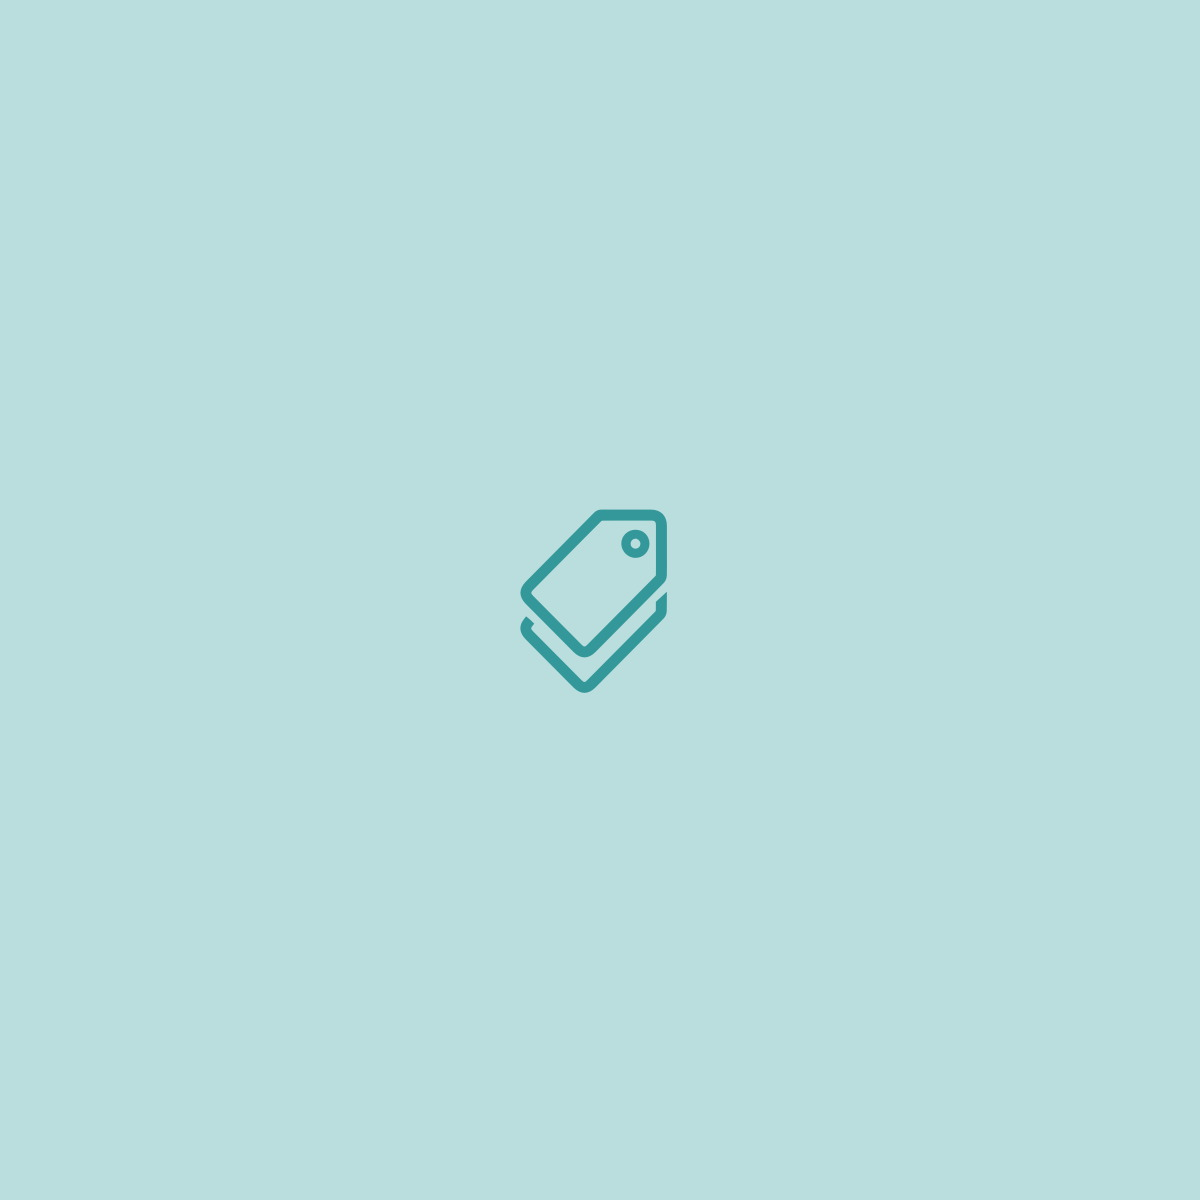 adesivo jateado quadrado p box vidro po box.jpg #6F3C2E 1200x1127 Adesivo Box Banheiro Jateado